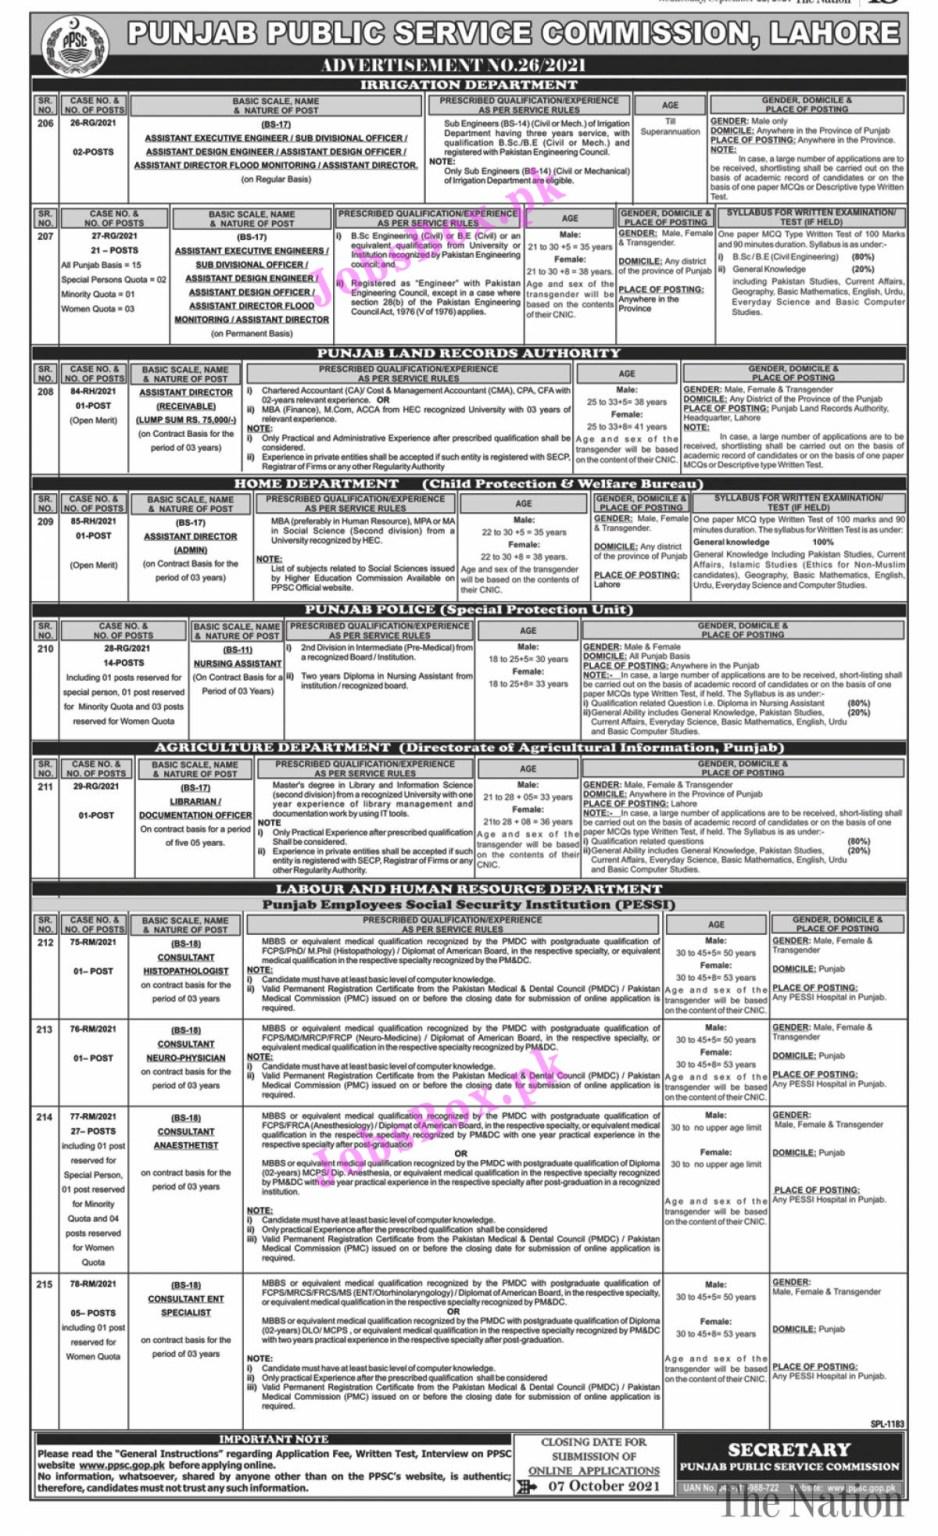 PPSC Jobs 2021 || PPSC Jobs 2021 Online Application Form || www.PPSC.Com